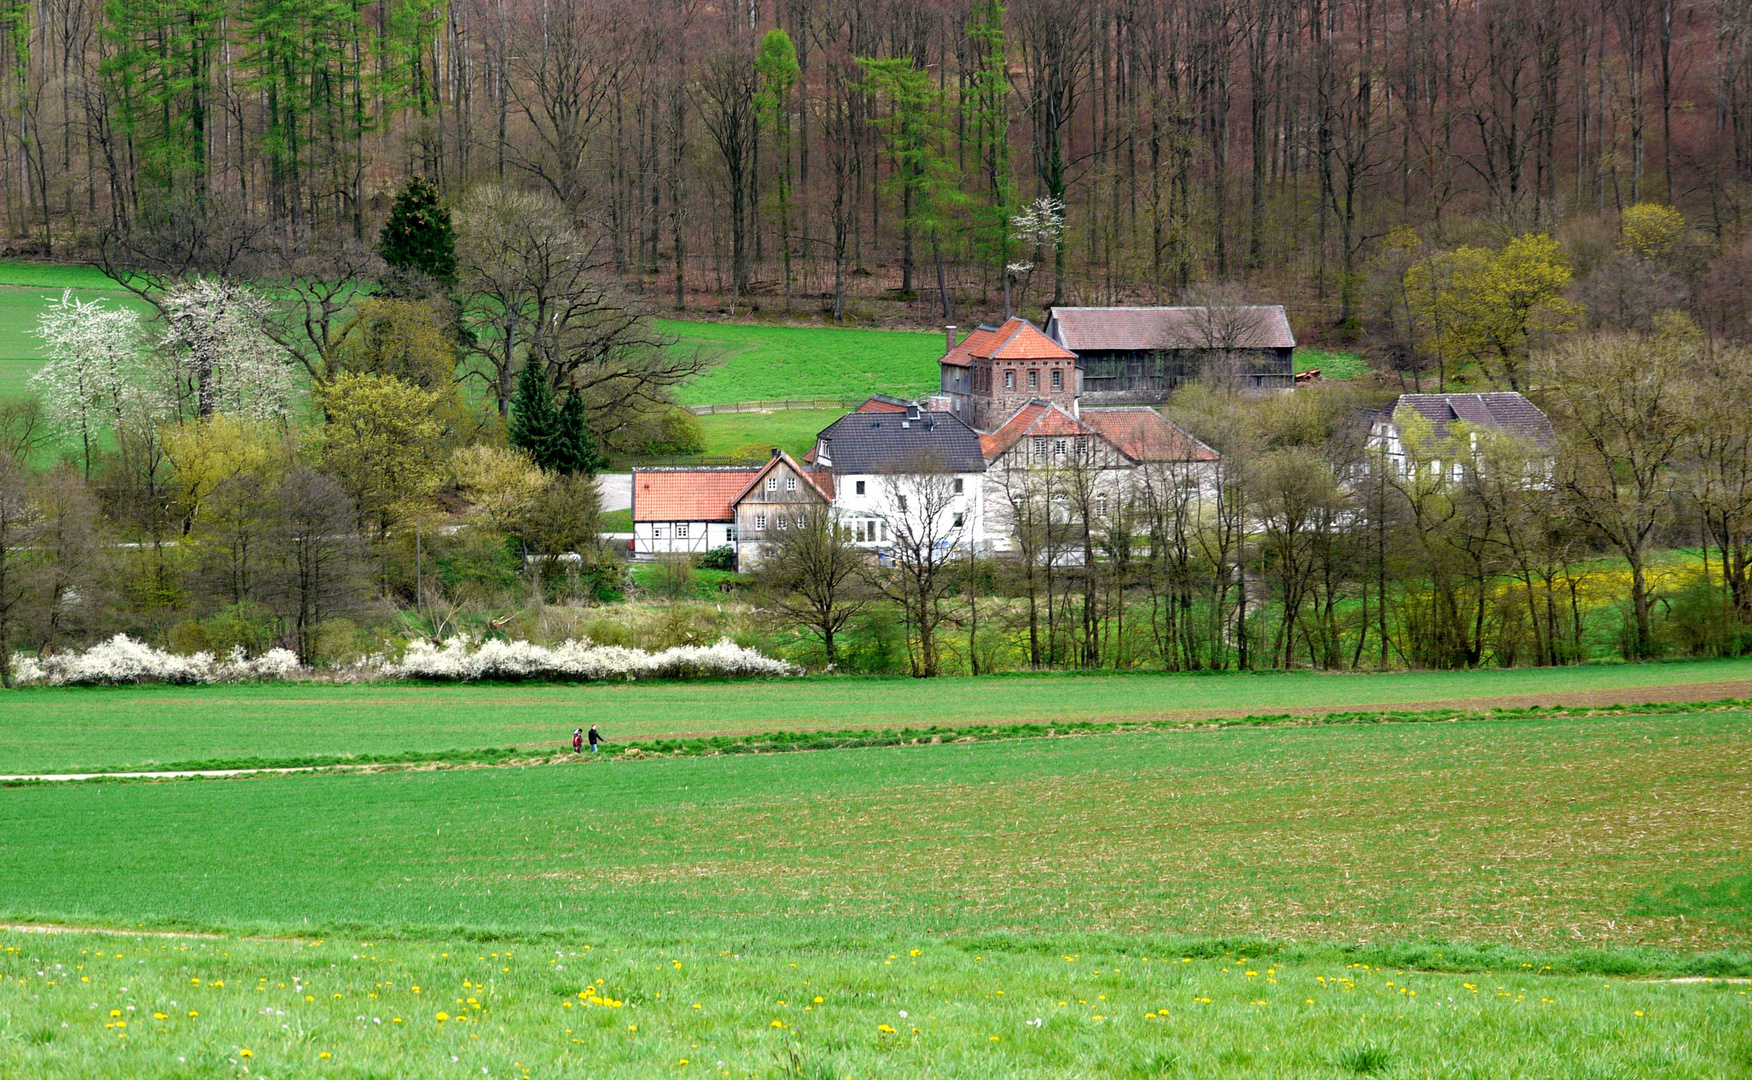 Luisenhütte